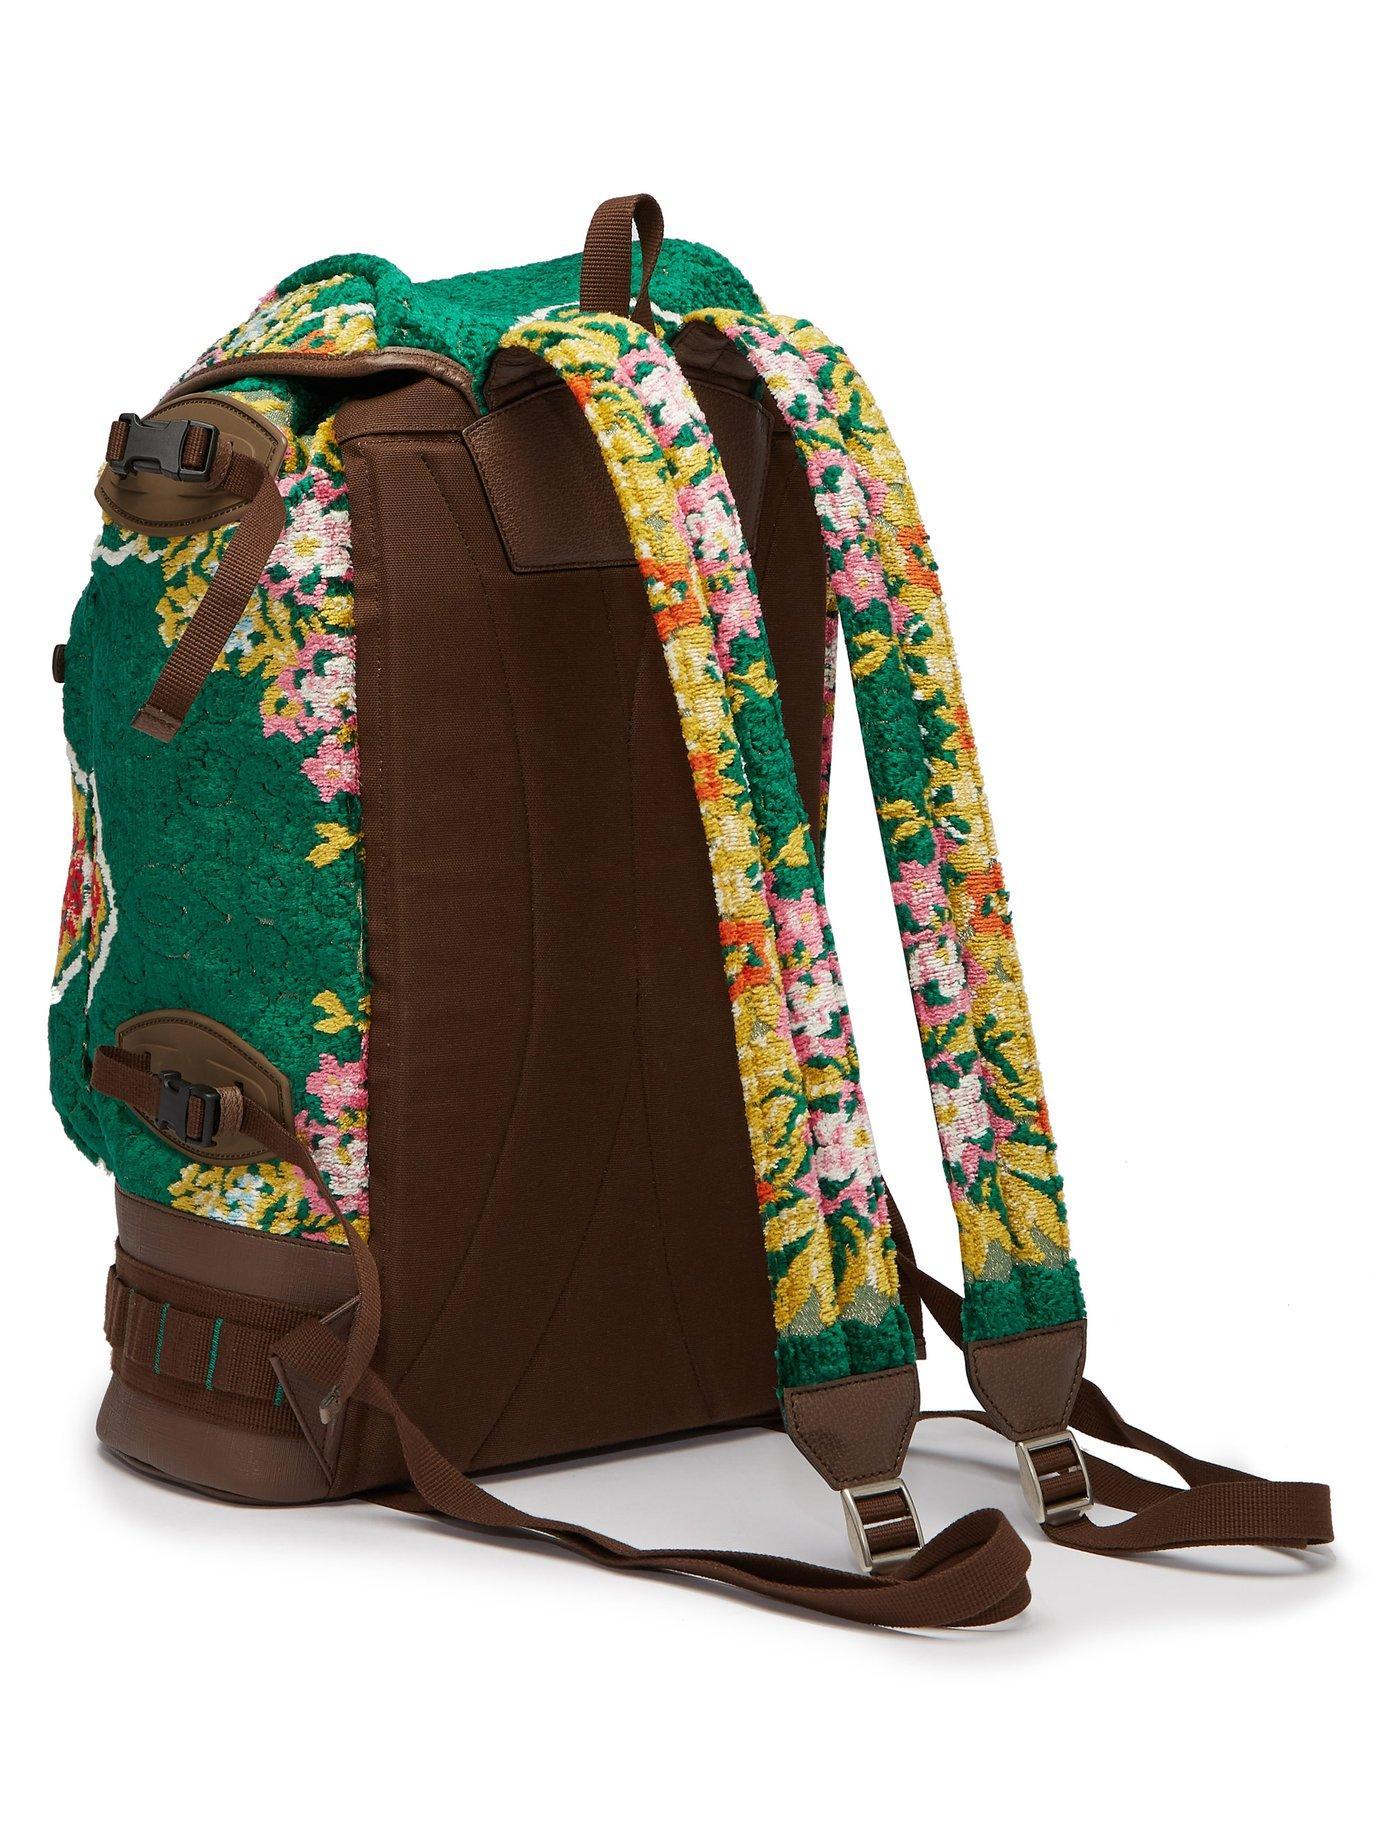 b799631de3a1 Gucci - Green Large Floral Velvet Jacquard Backpack for Men - Lyst. View  fullscreen